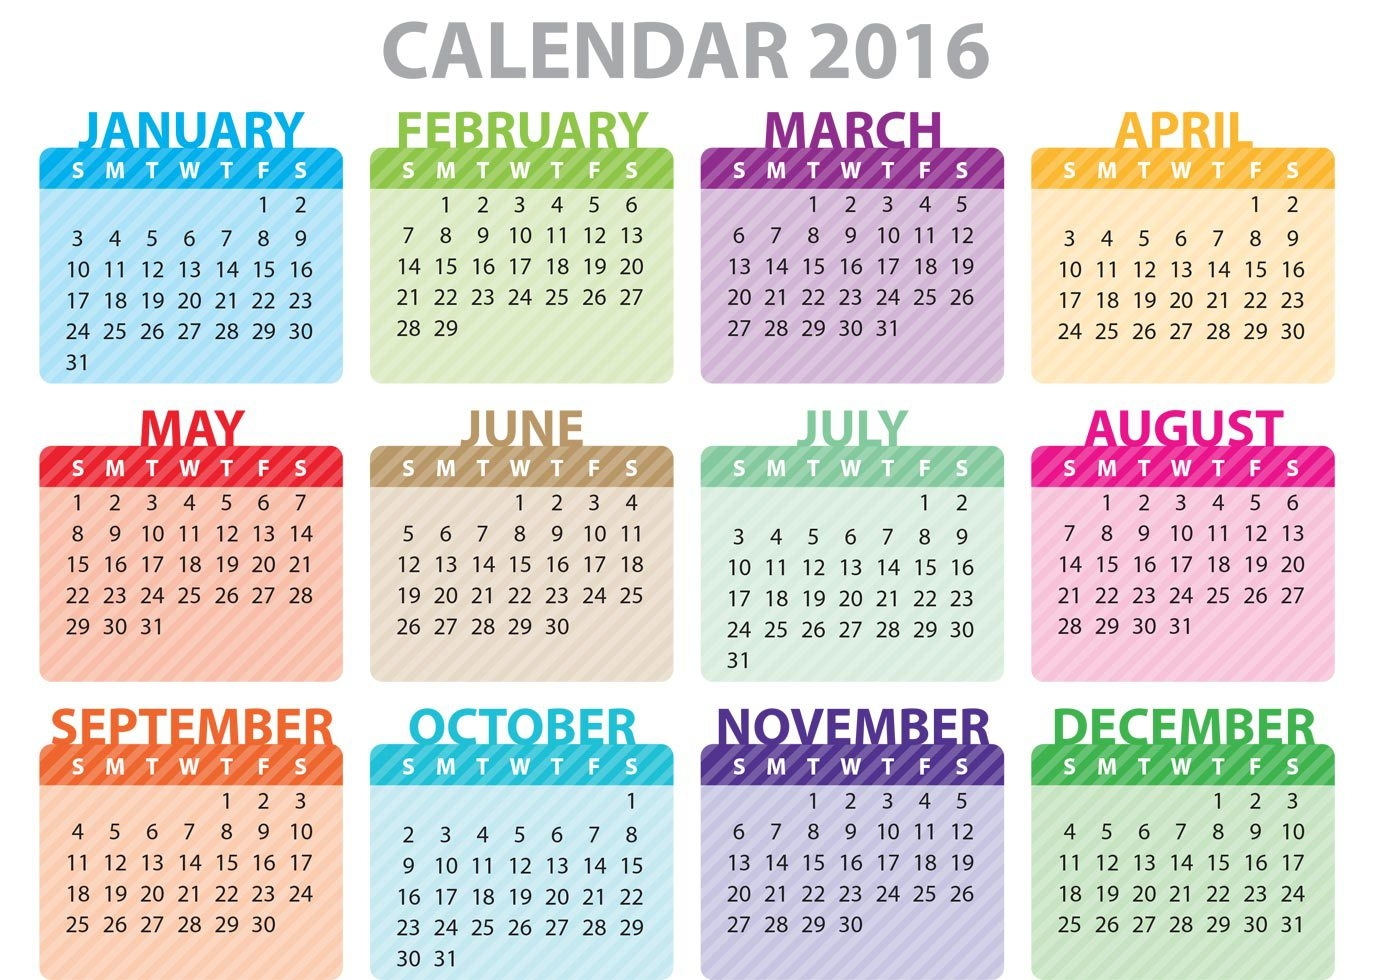 Momslifeboat 2017 Calendar Calendar Template 20173abry